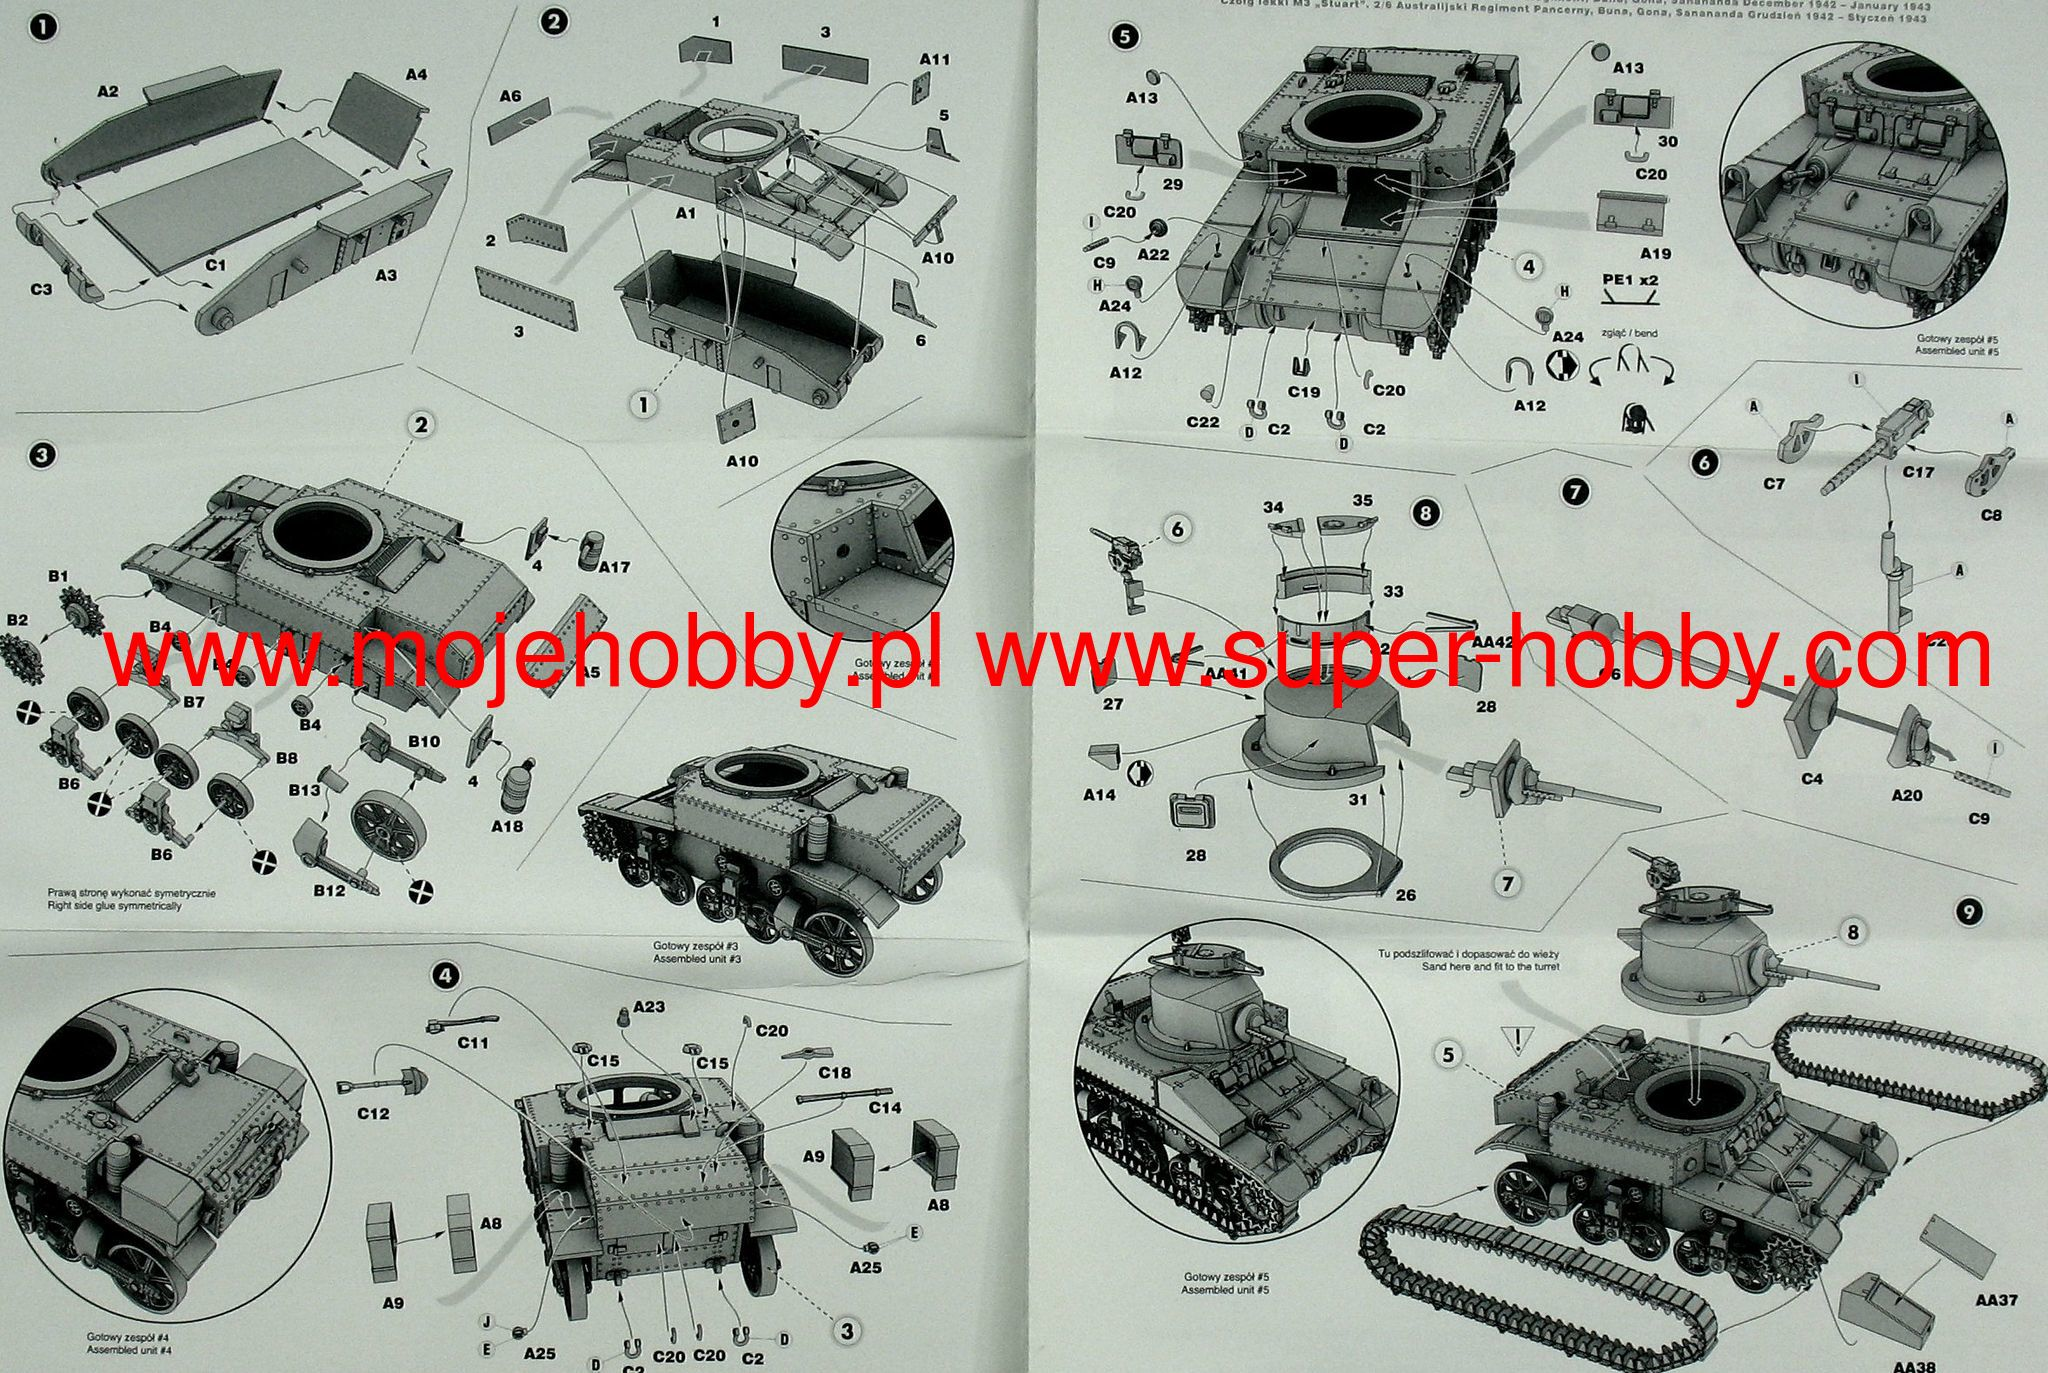 Mirage Hobby 726069-1:72 M3 STUART Light Tank 2//6th Australian Armoured Regime